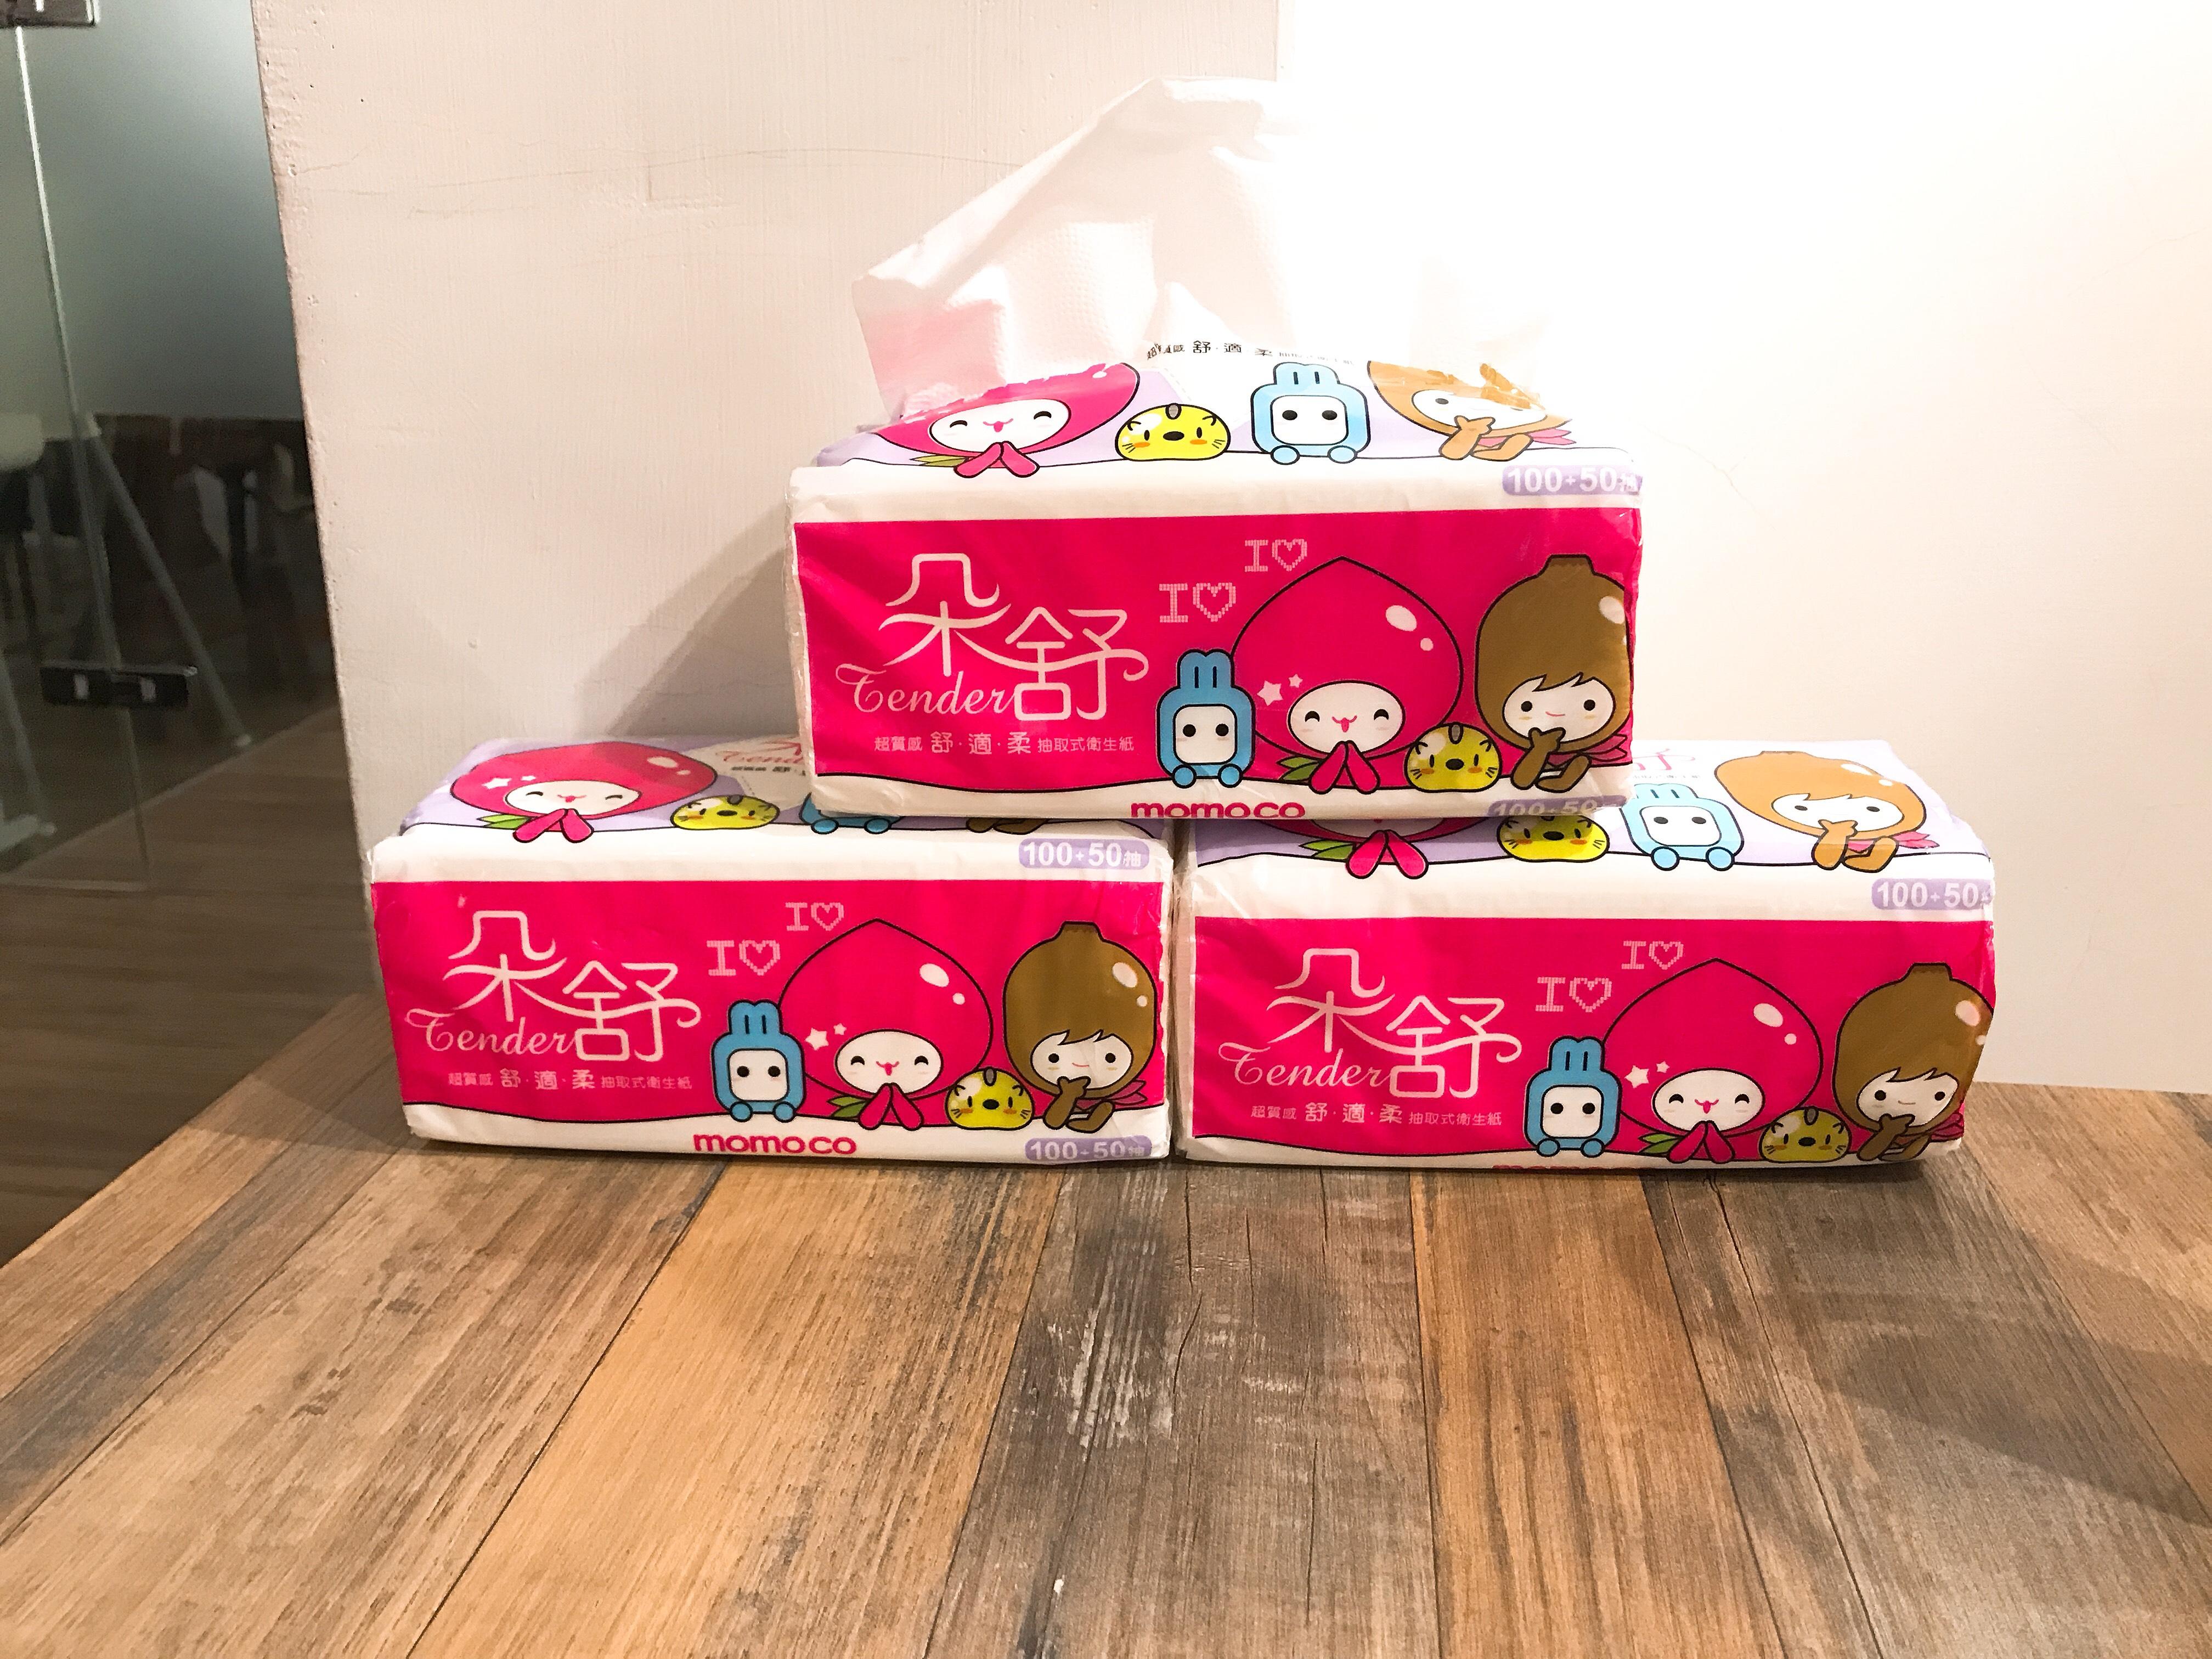 momo獨家上市!超萌朵舒momco 衛生紙柔軟新升級